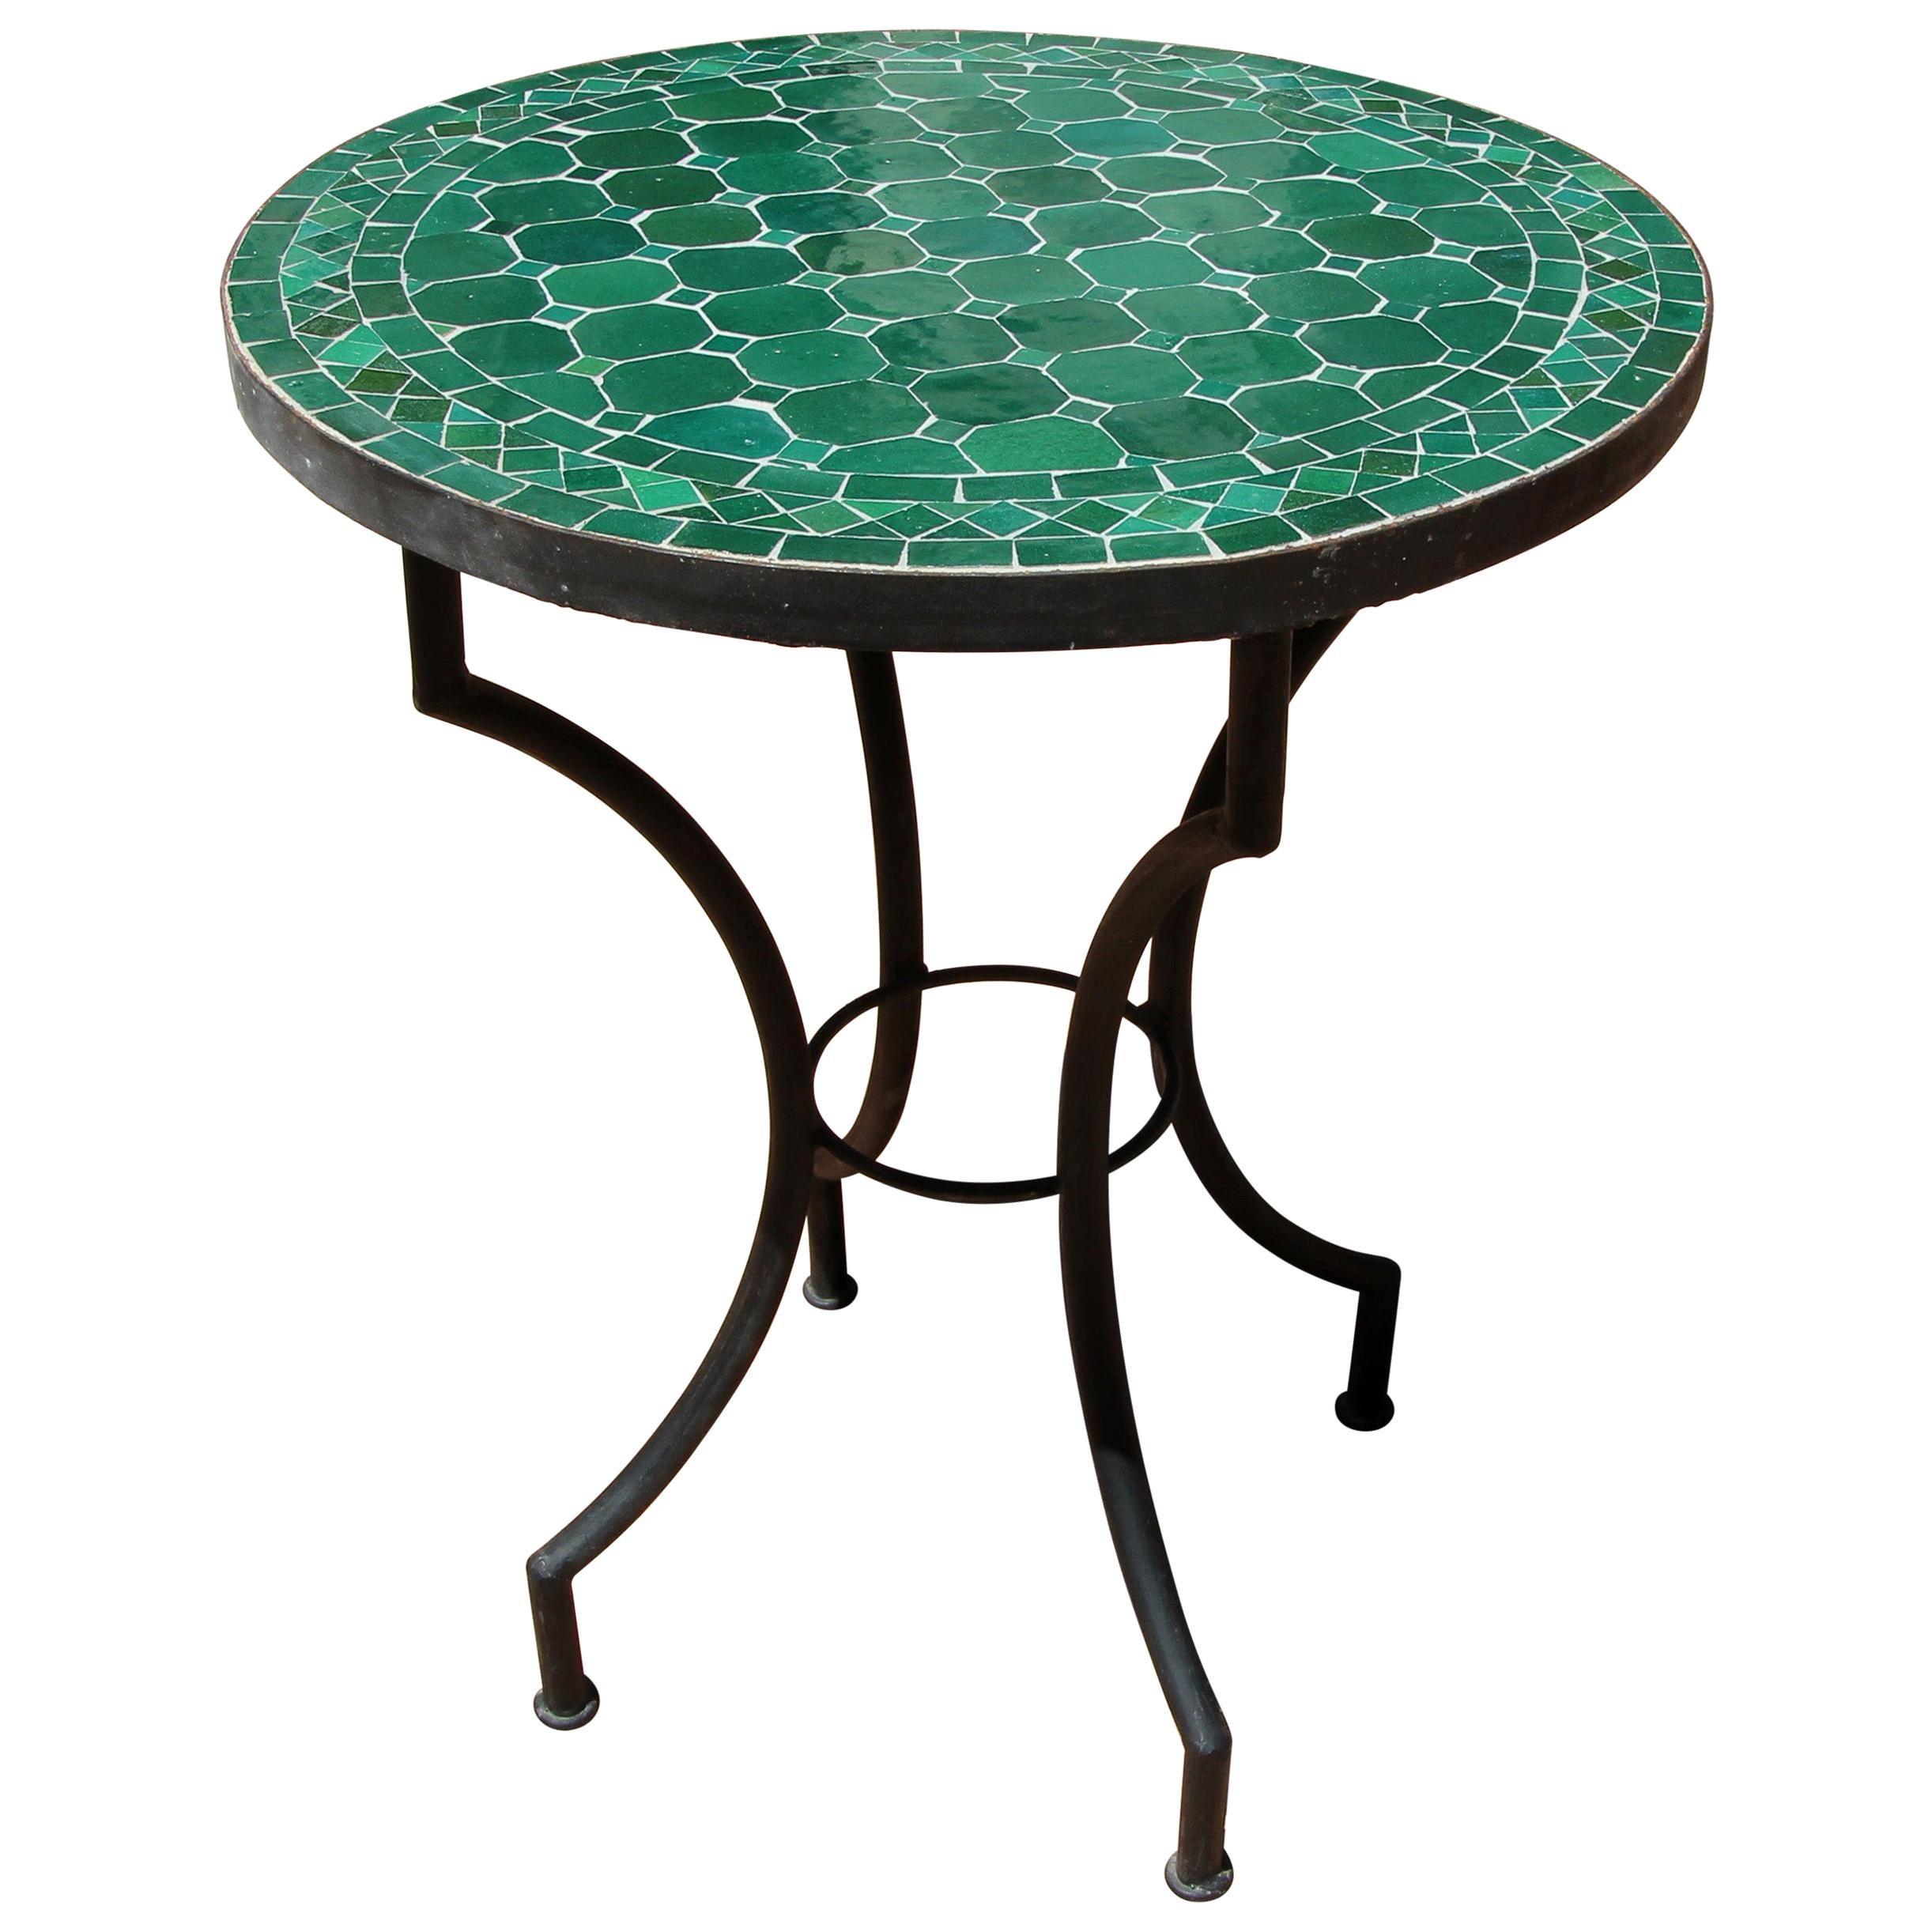 Moroccan Mosaic Emerald Green Tiles Bistro Table